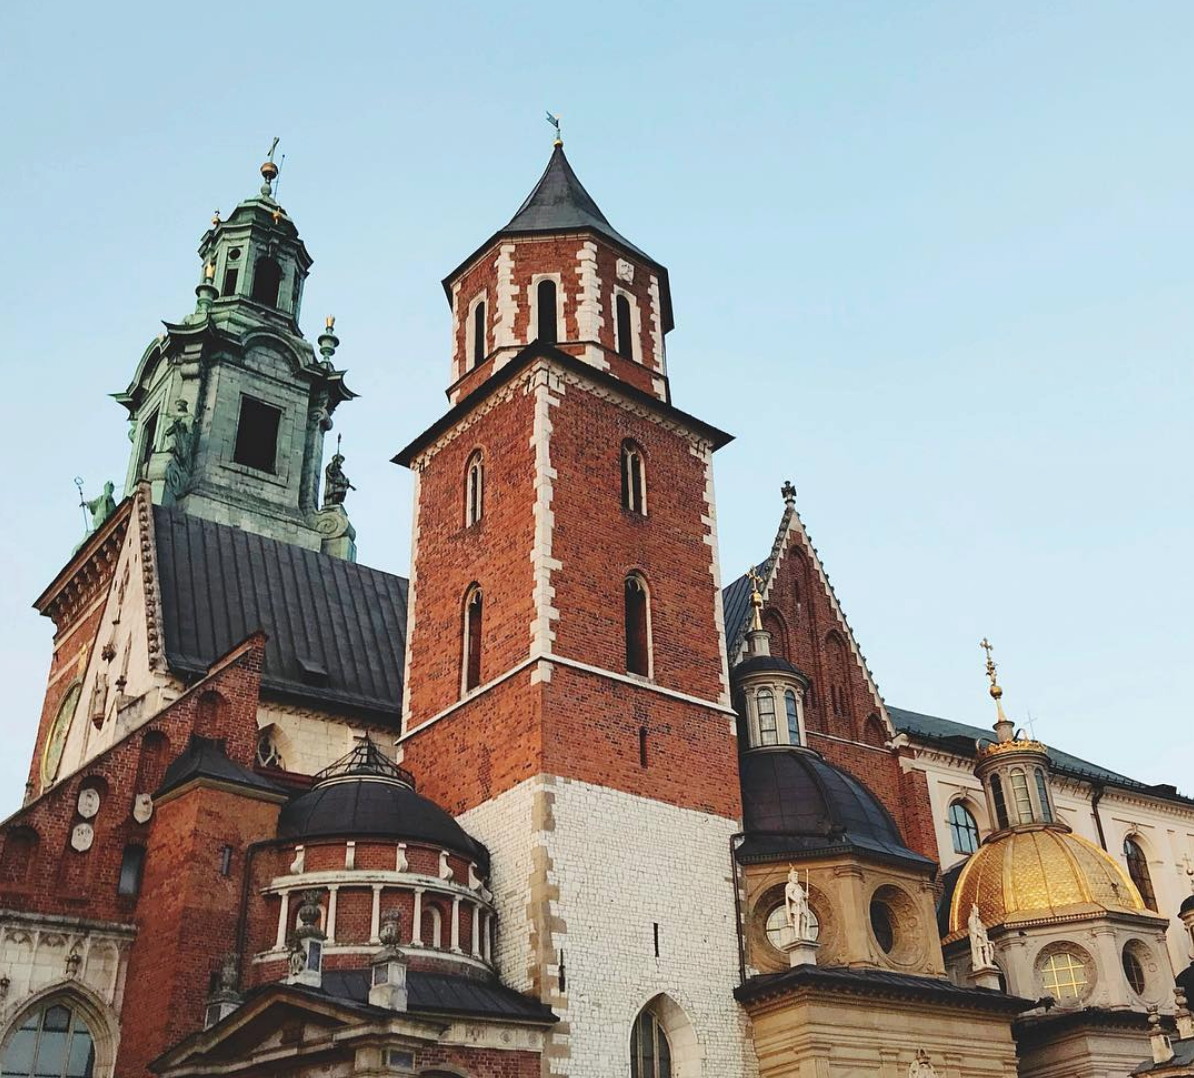 LDS church in Poland